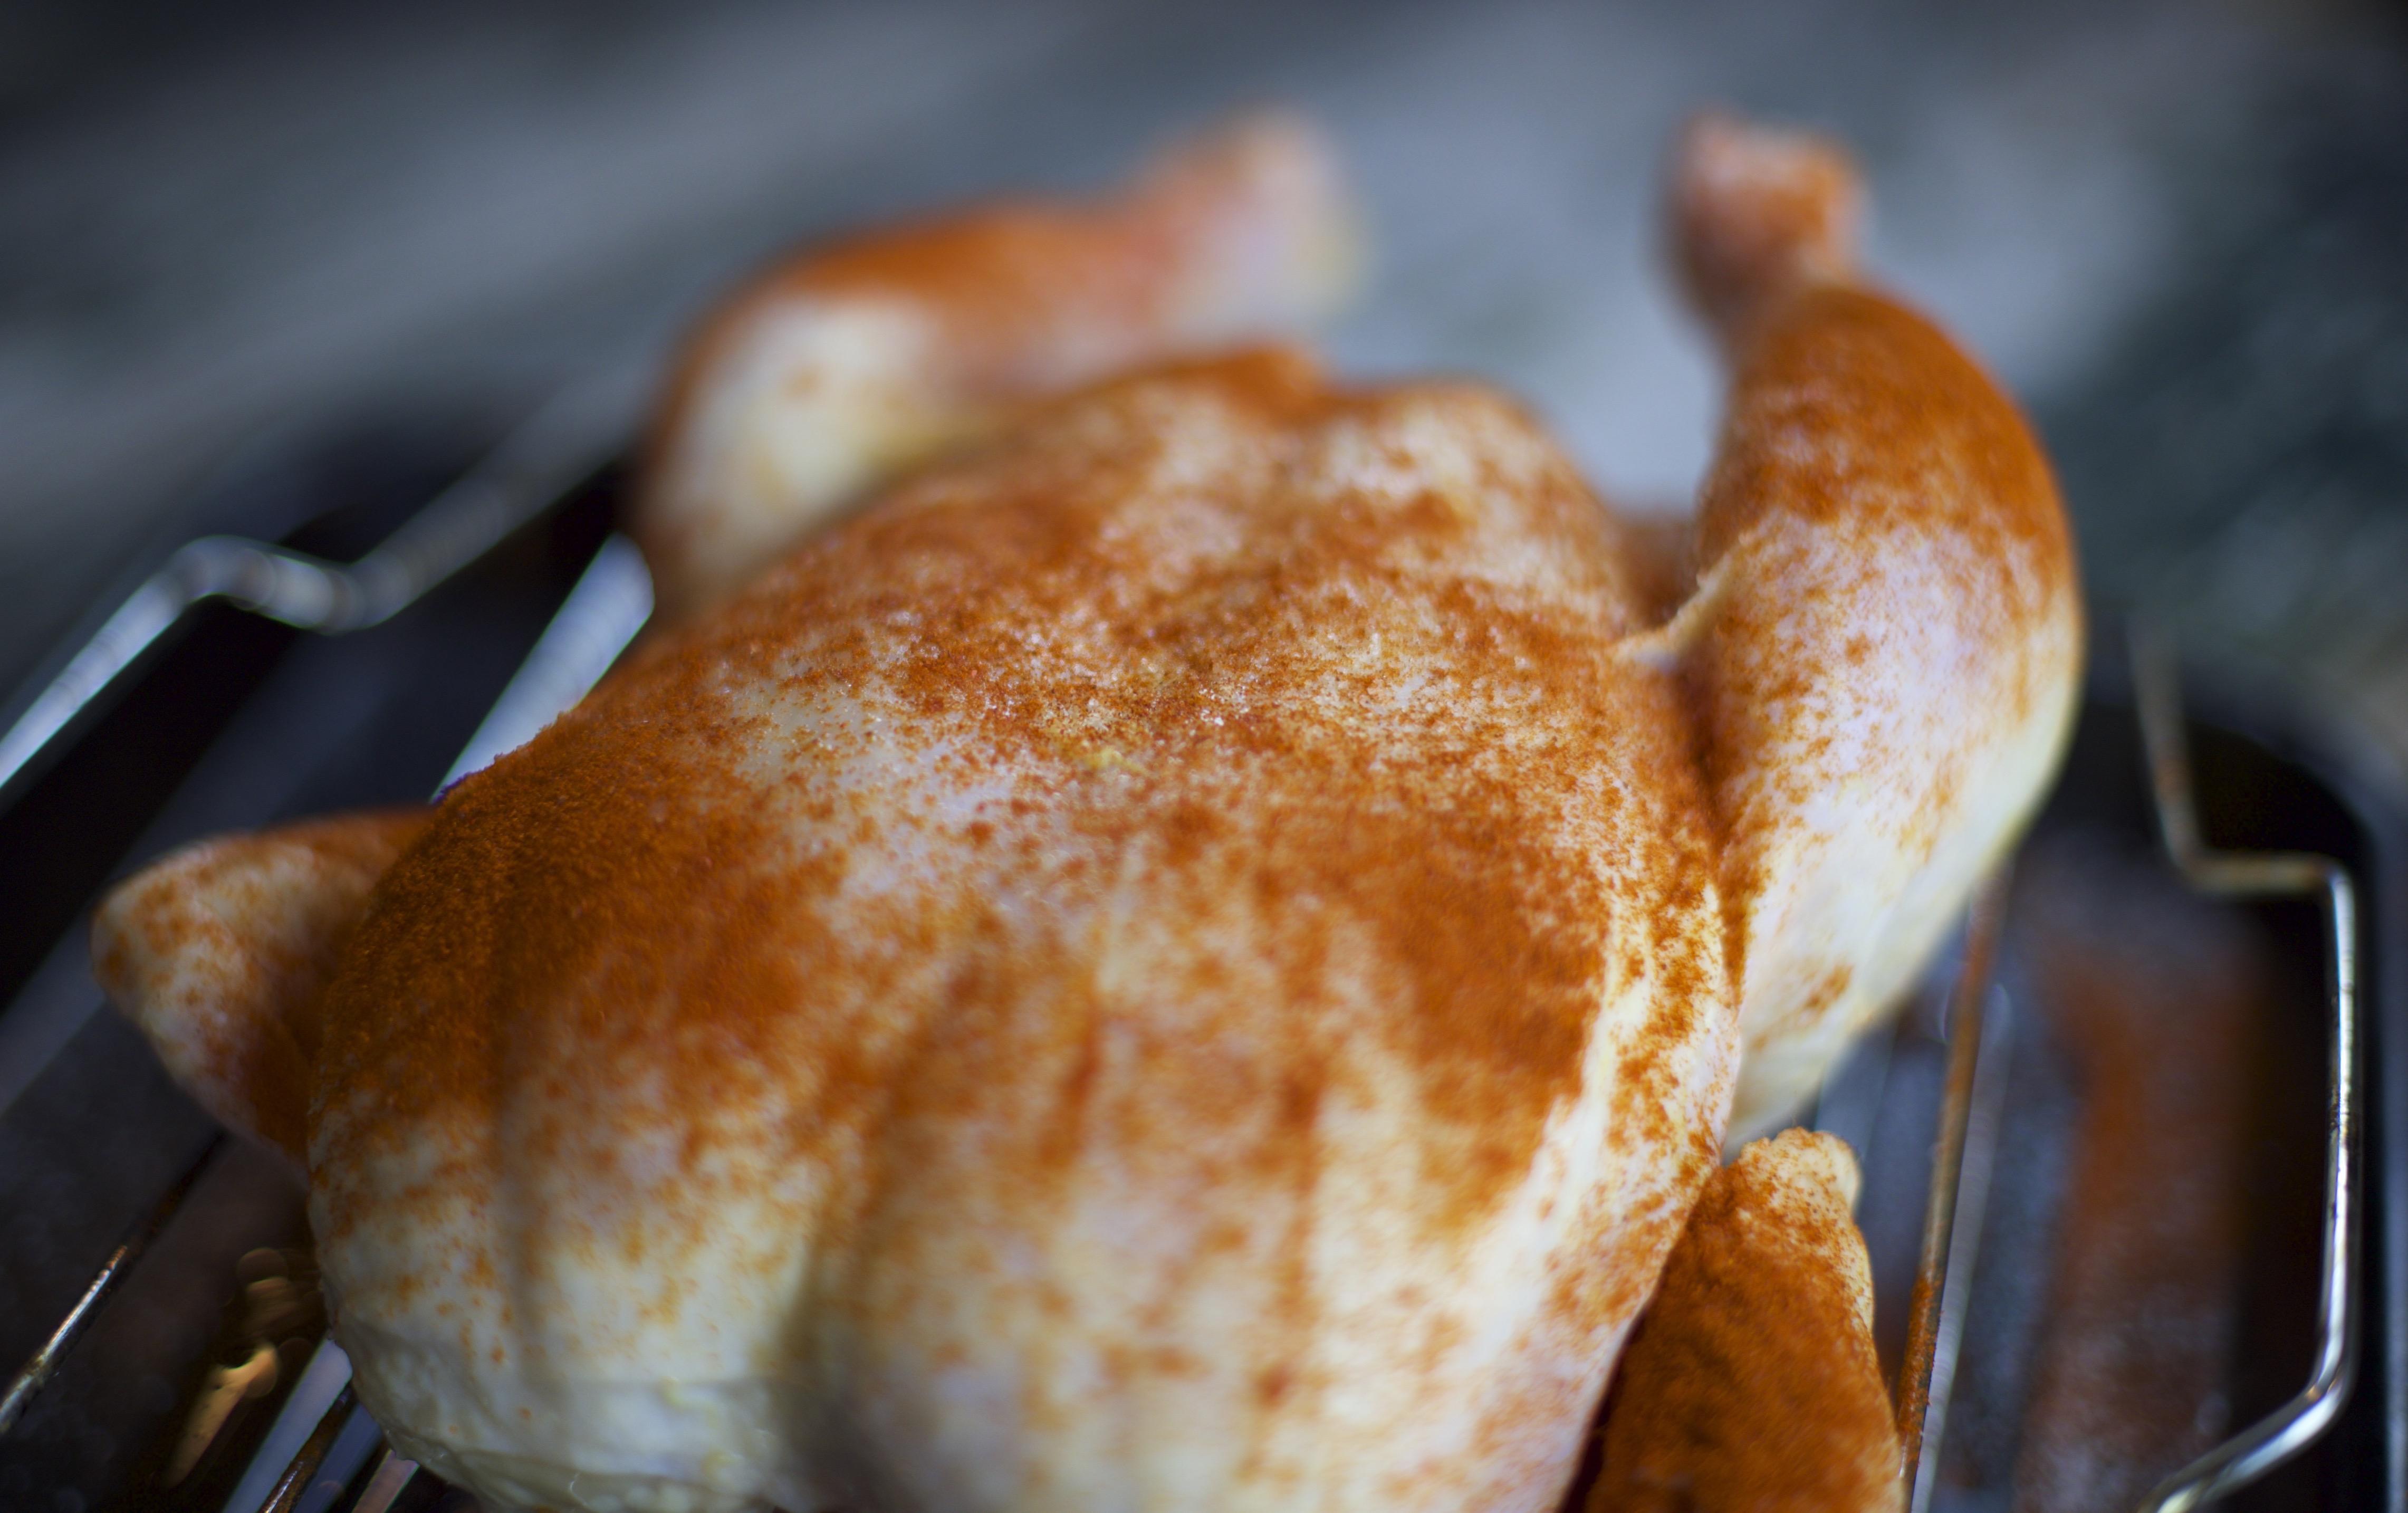 Up close photo of raw chicken